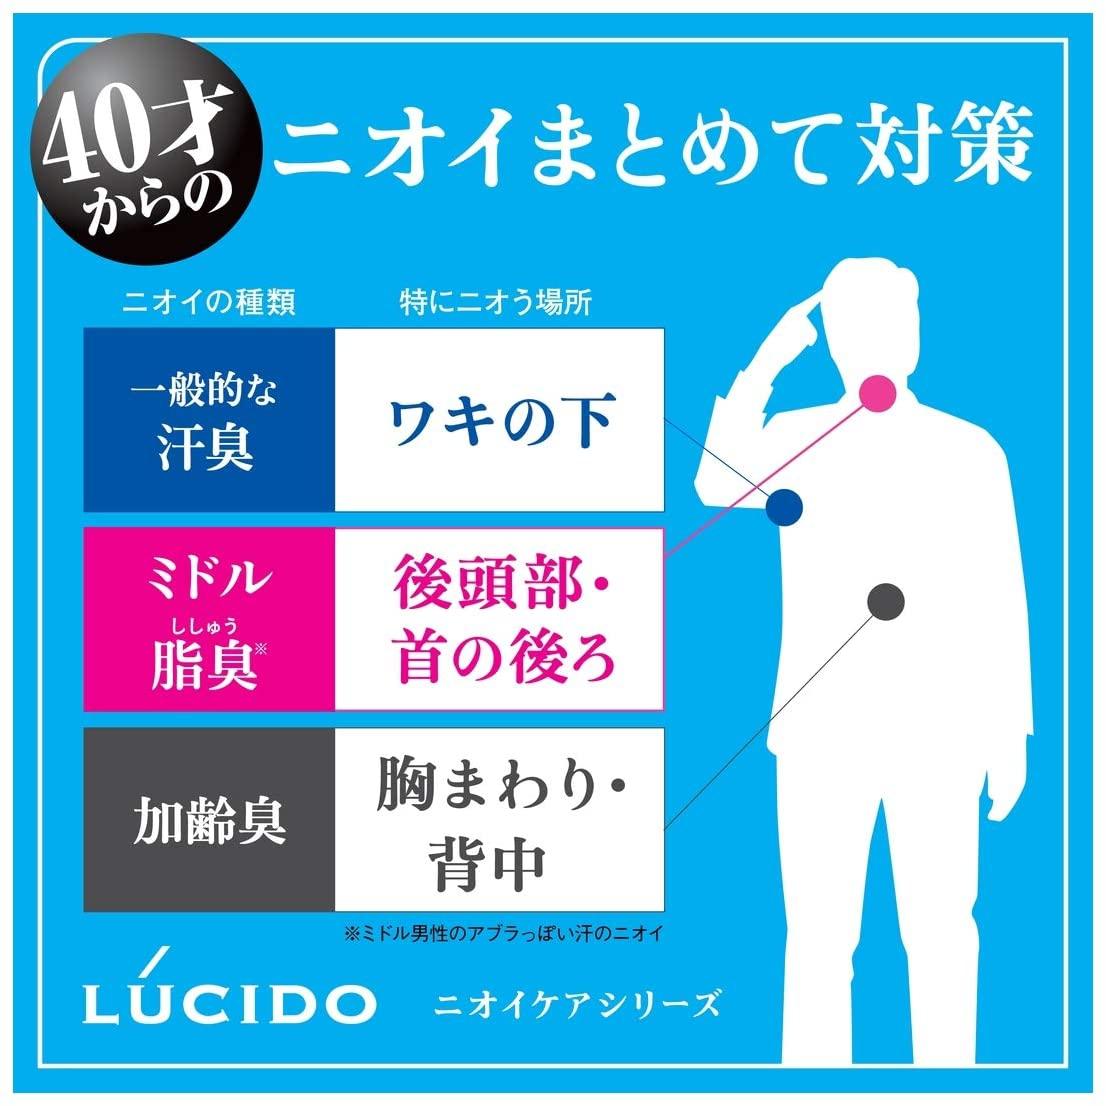 LUCIDO(ルシード)薬用デオドラント高密着スティックの商品画像5